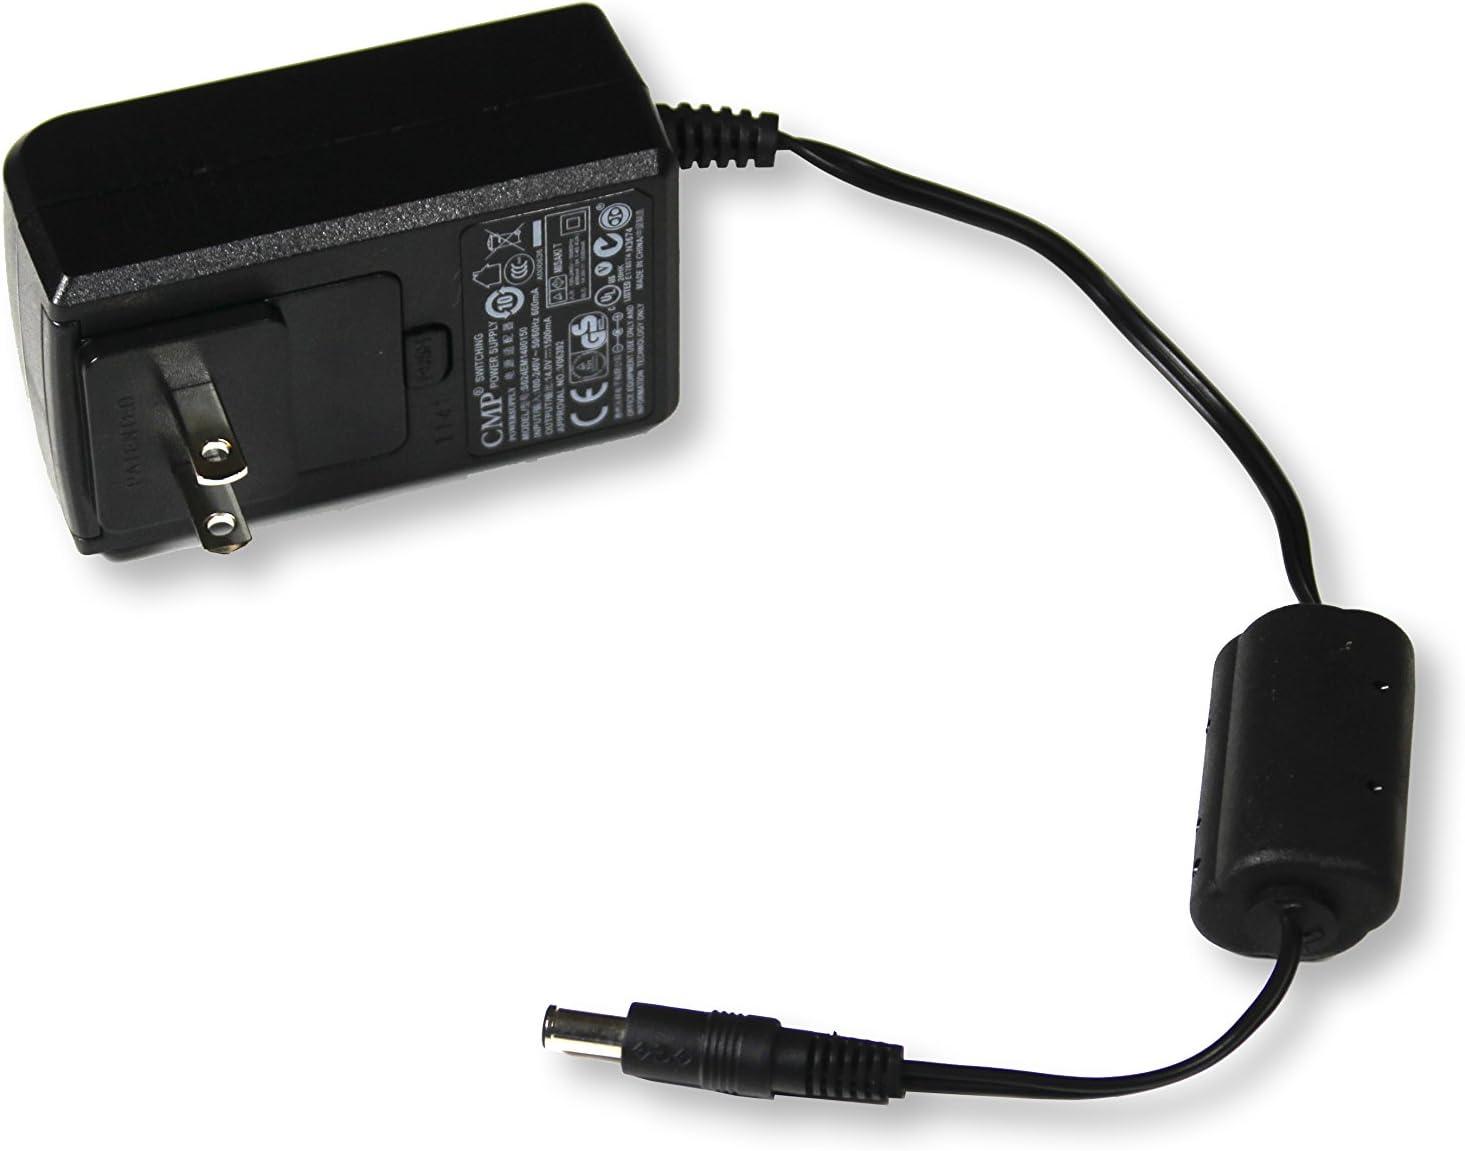 Konftel 900102125 300 Series Power Supply Us